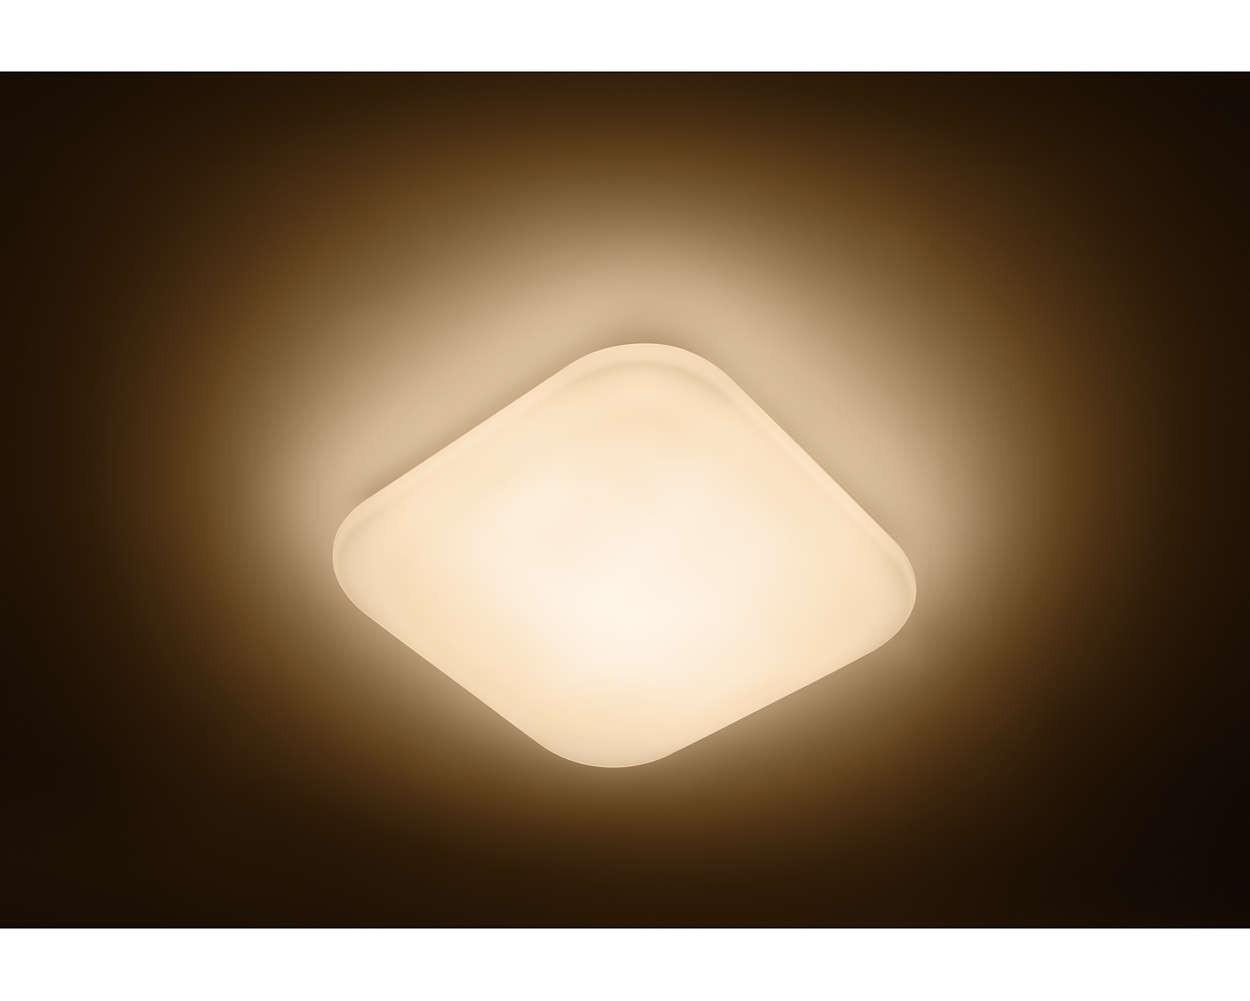 Plafoniere Esterno Philips : Plafoniera a led bianca philips malva 17w luce calda area illumina